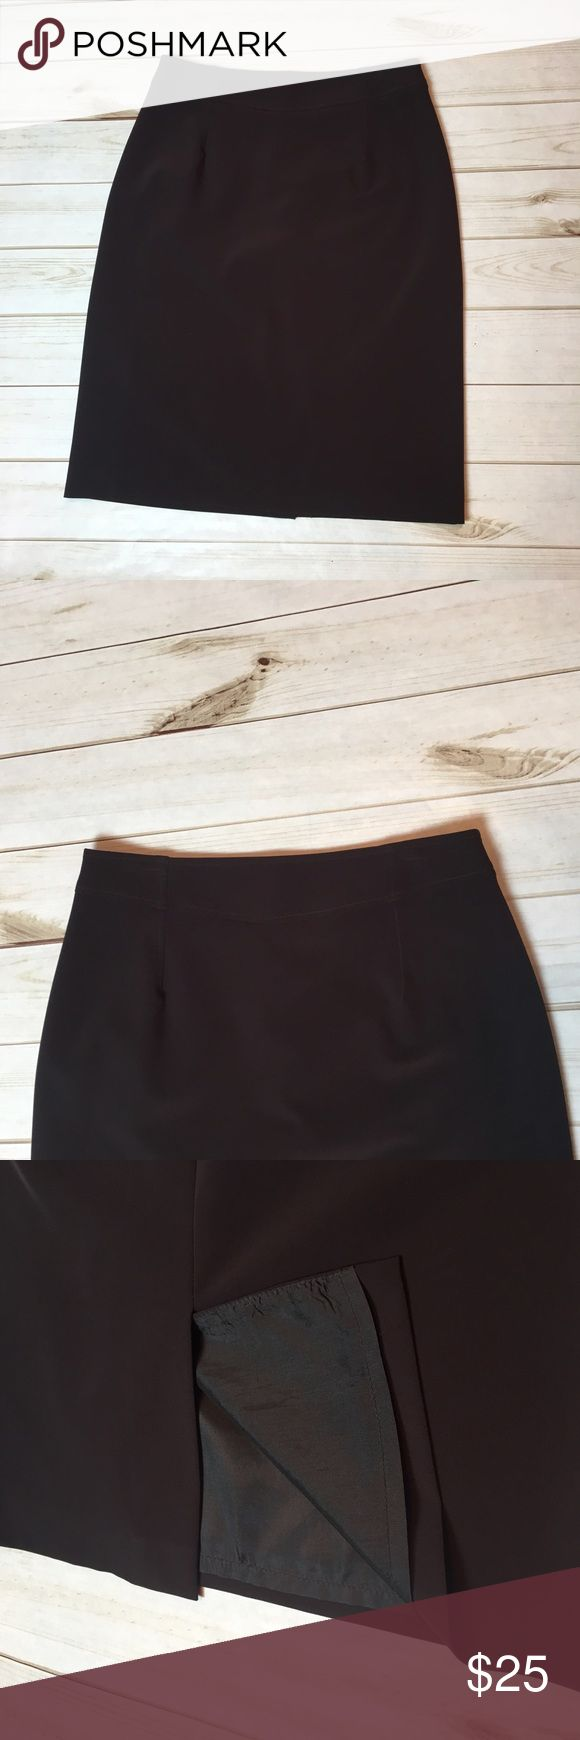 "{Louben} chocolate brown pencil skirt. {Louben} chocolate brown pencil skirt. Size 10, waist 32"", hips 20"" across flat, back zipper 8"", length from top of waist to bottom of skirt 25"", rear slit 7 1/2"". Great Condition! Louben Skirts Pencil"